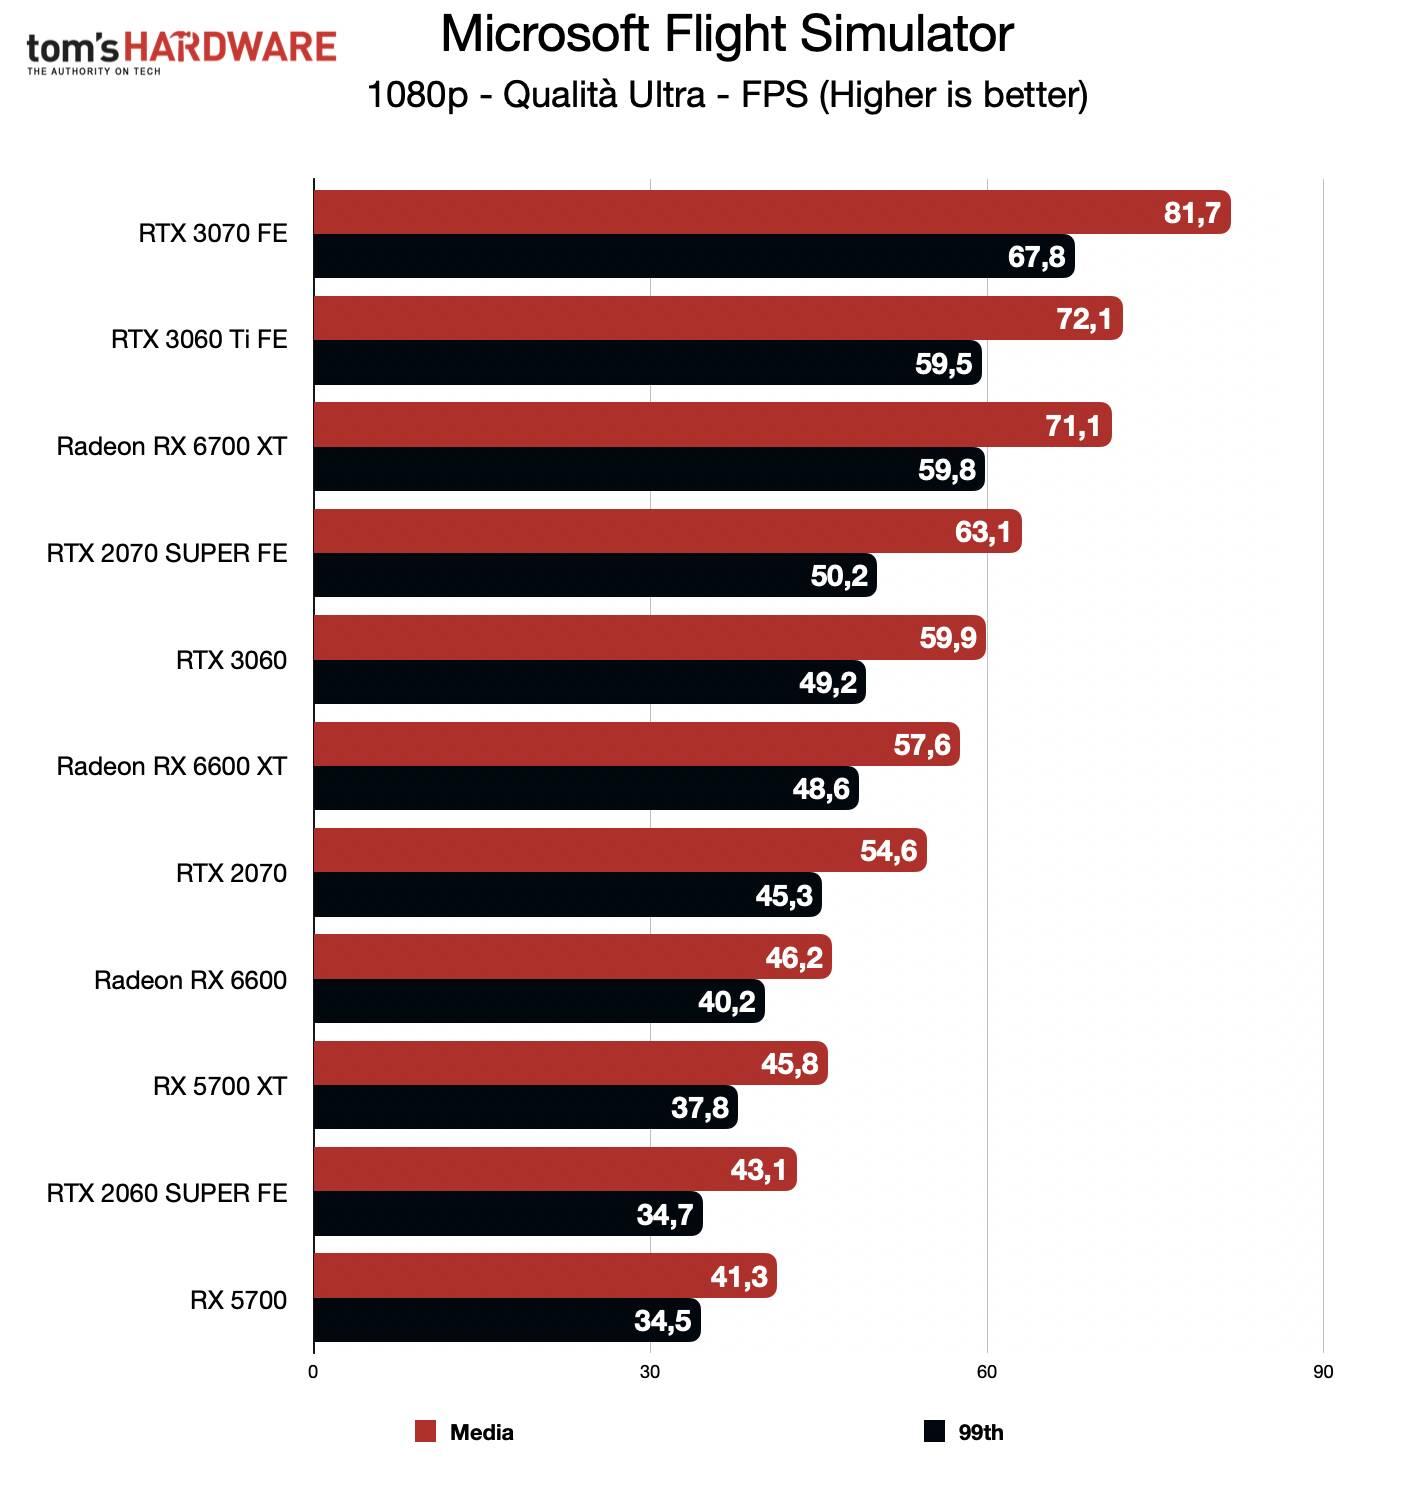 Benchmark Radeon RX 6600 - FHD - Microsoft Flight Simulator